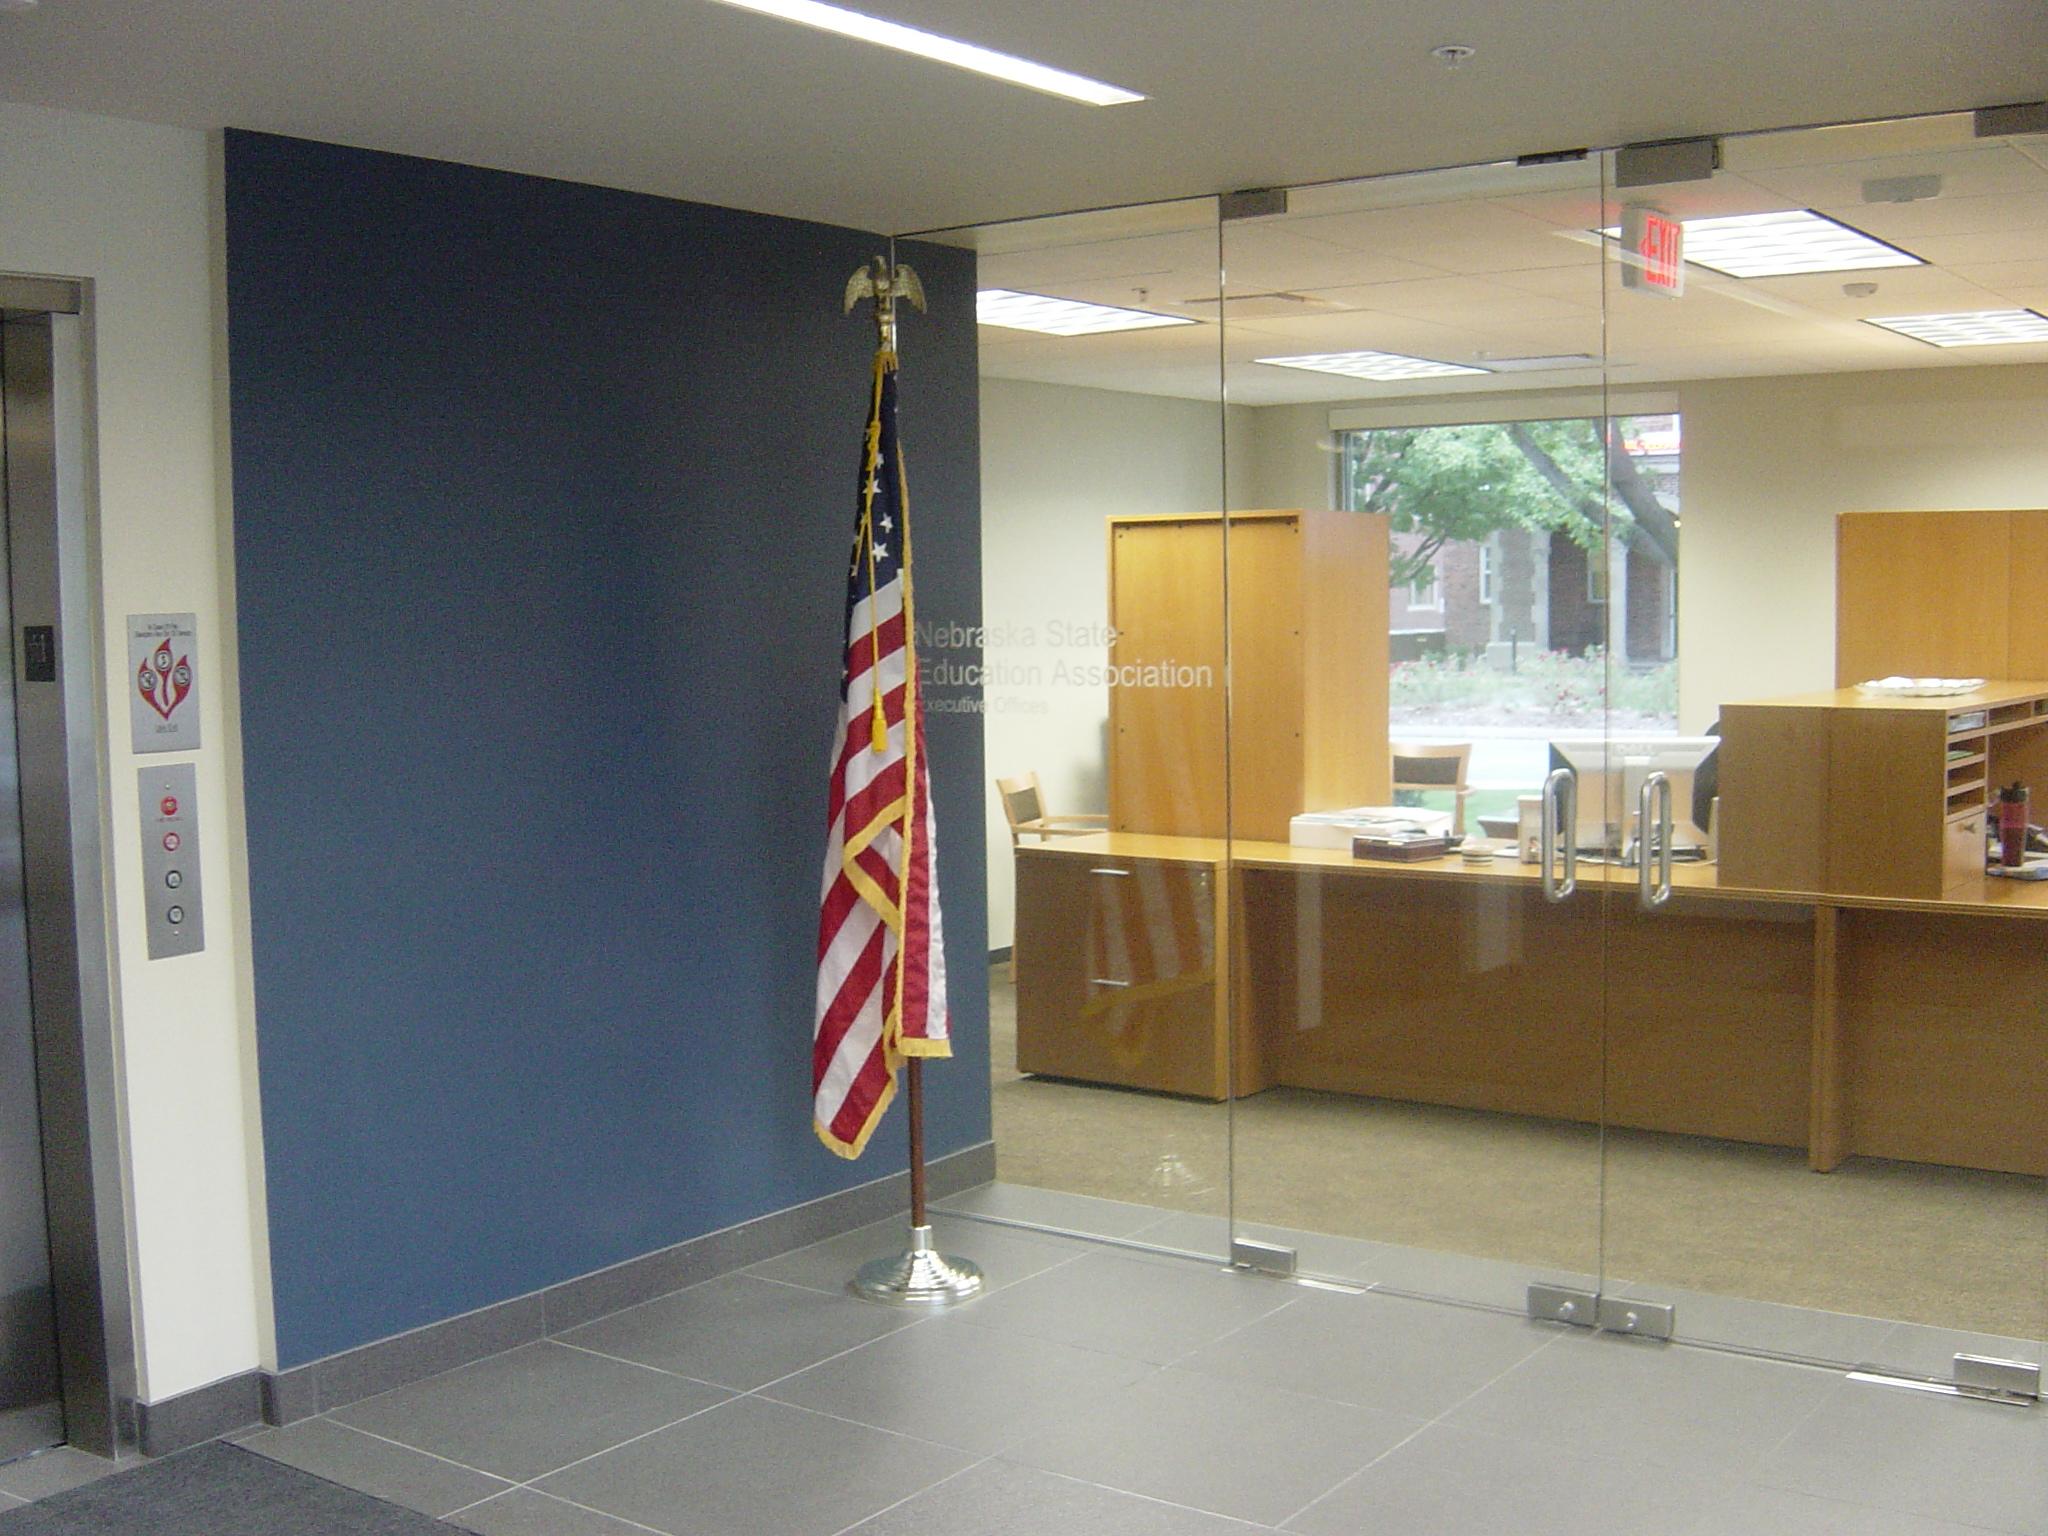 Reception area NSEA 006.jpg